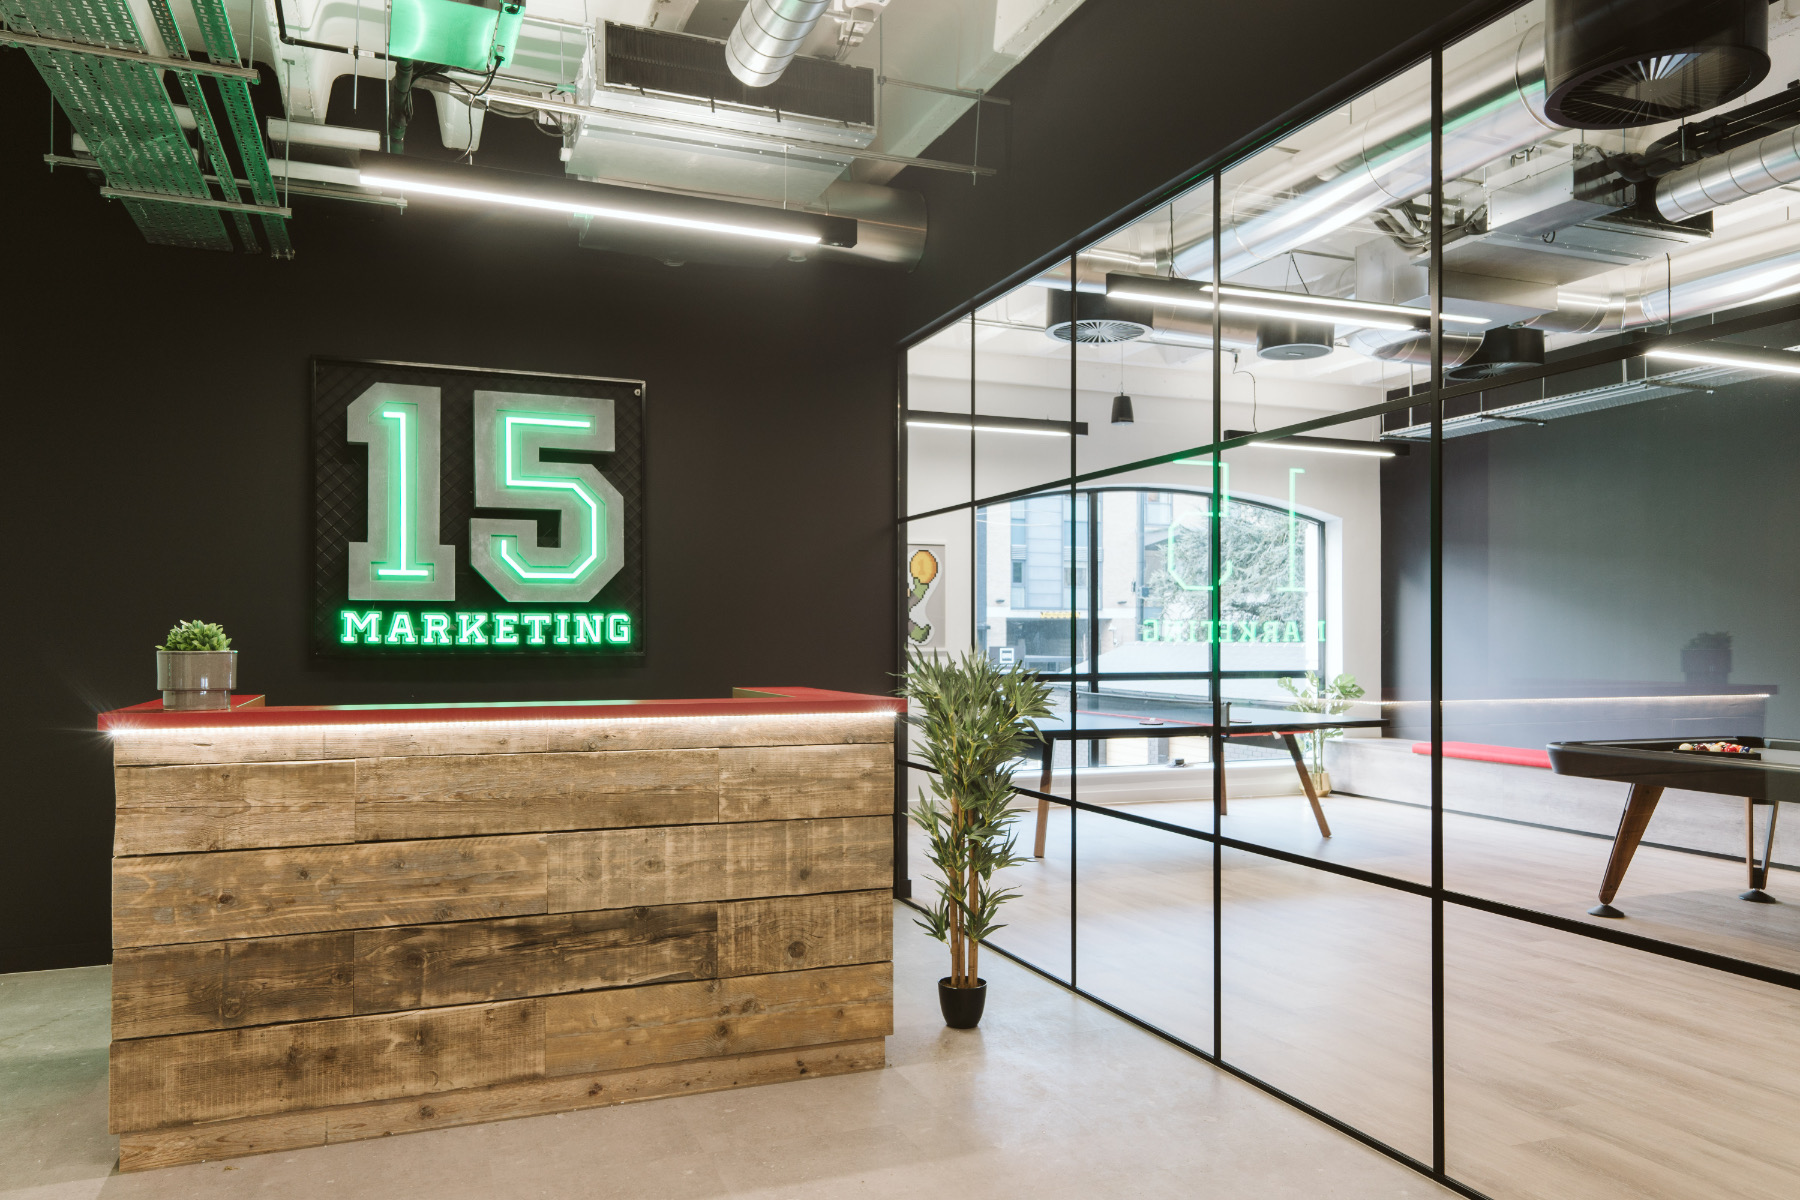 15-marketing-watford-office-2